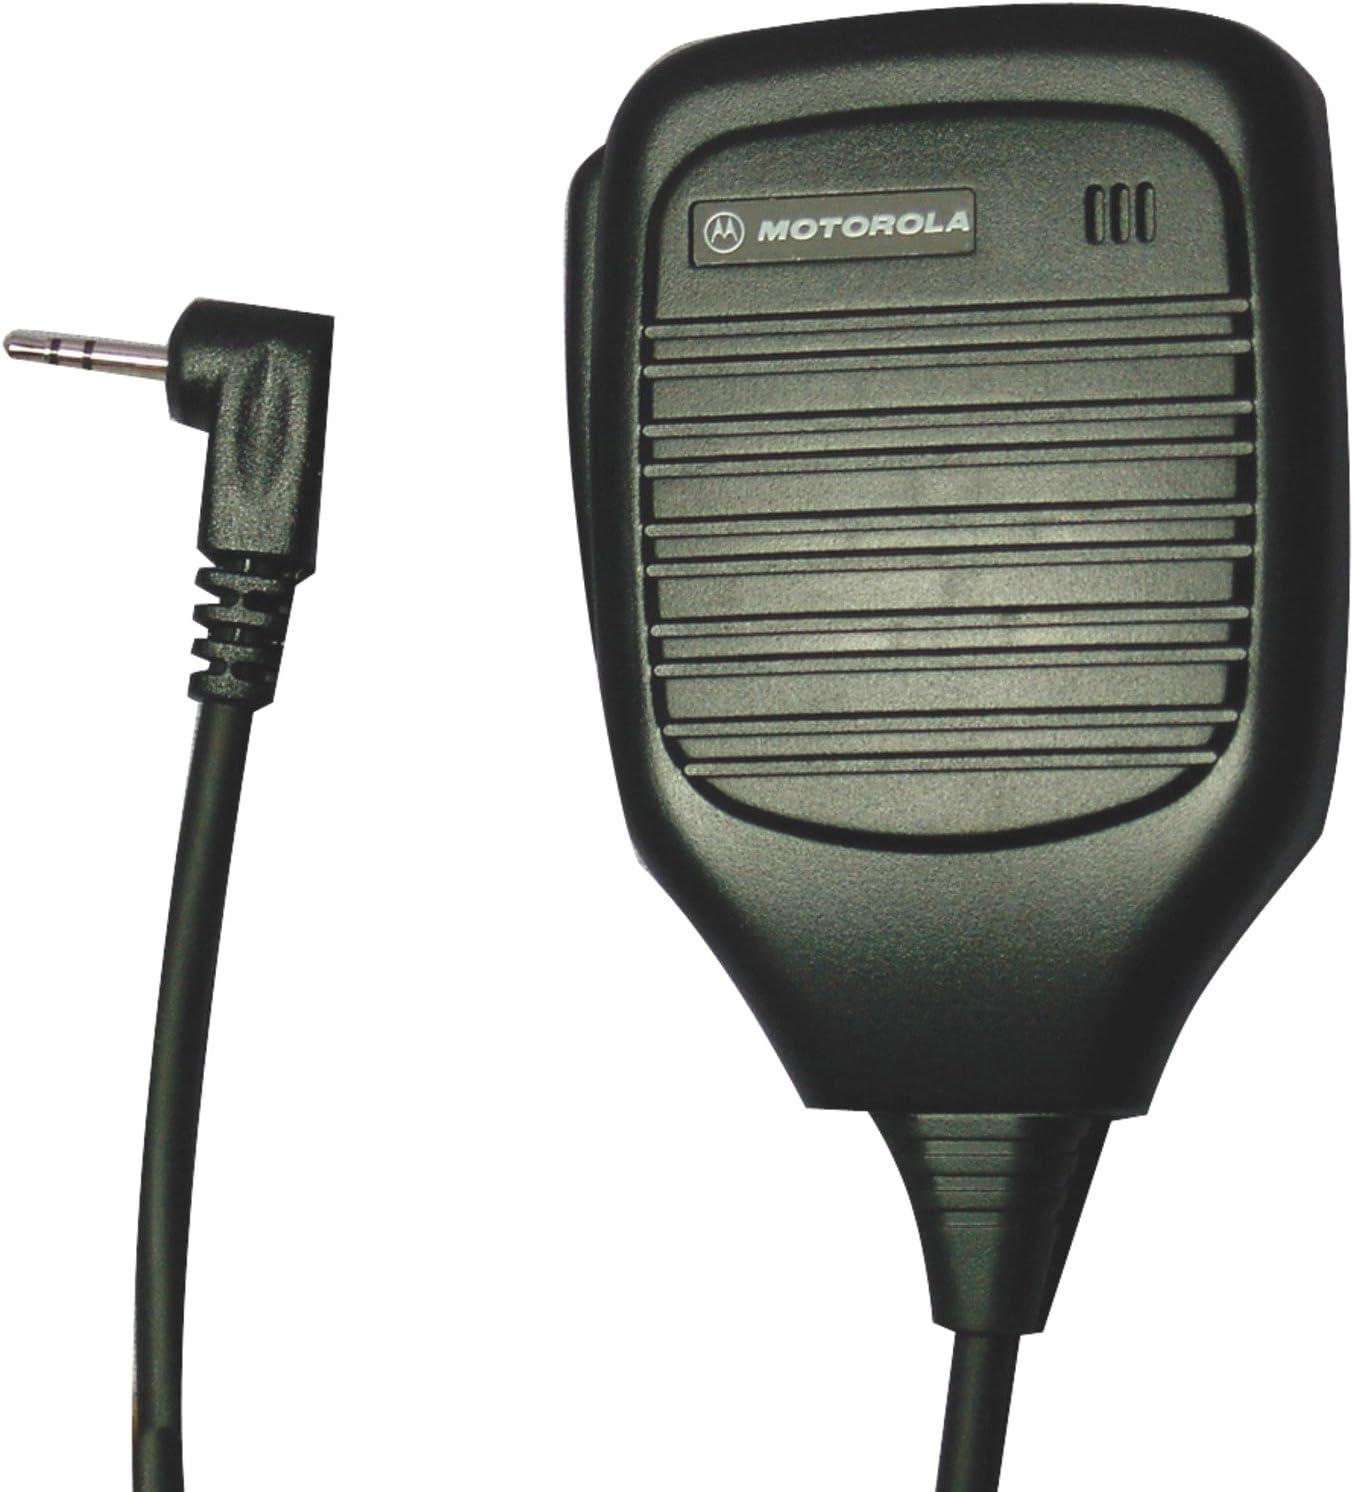 B00000JD34 Motorola 53724 Remote Speaker Microphone (Black) 711Vk-lH8QL